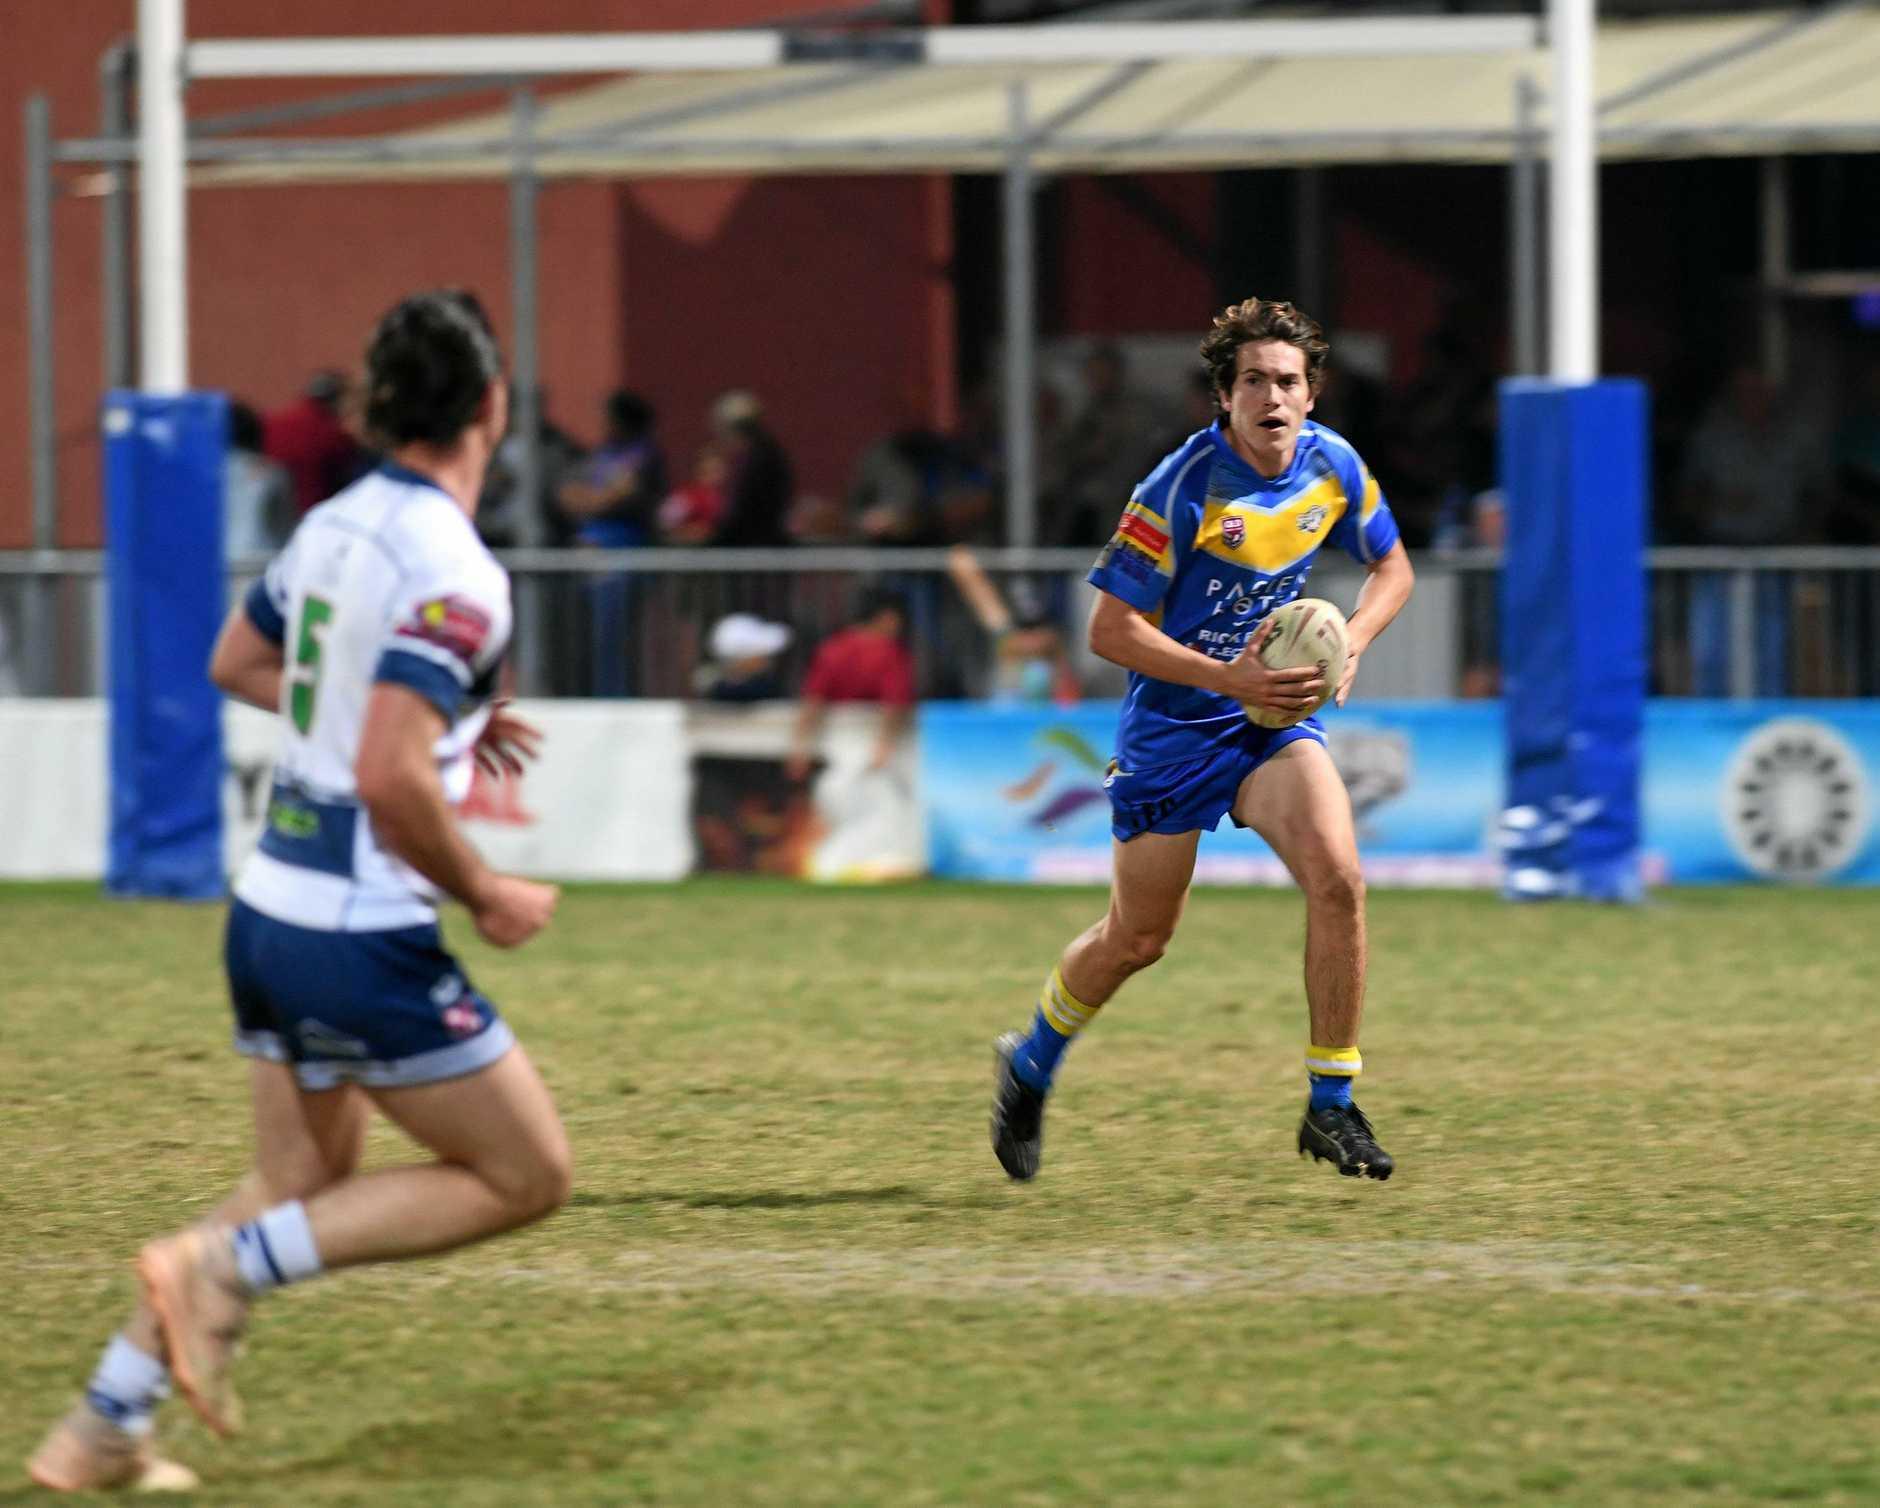 Rugby League Yeppoon's Brady Mckenna